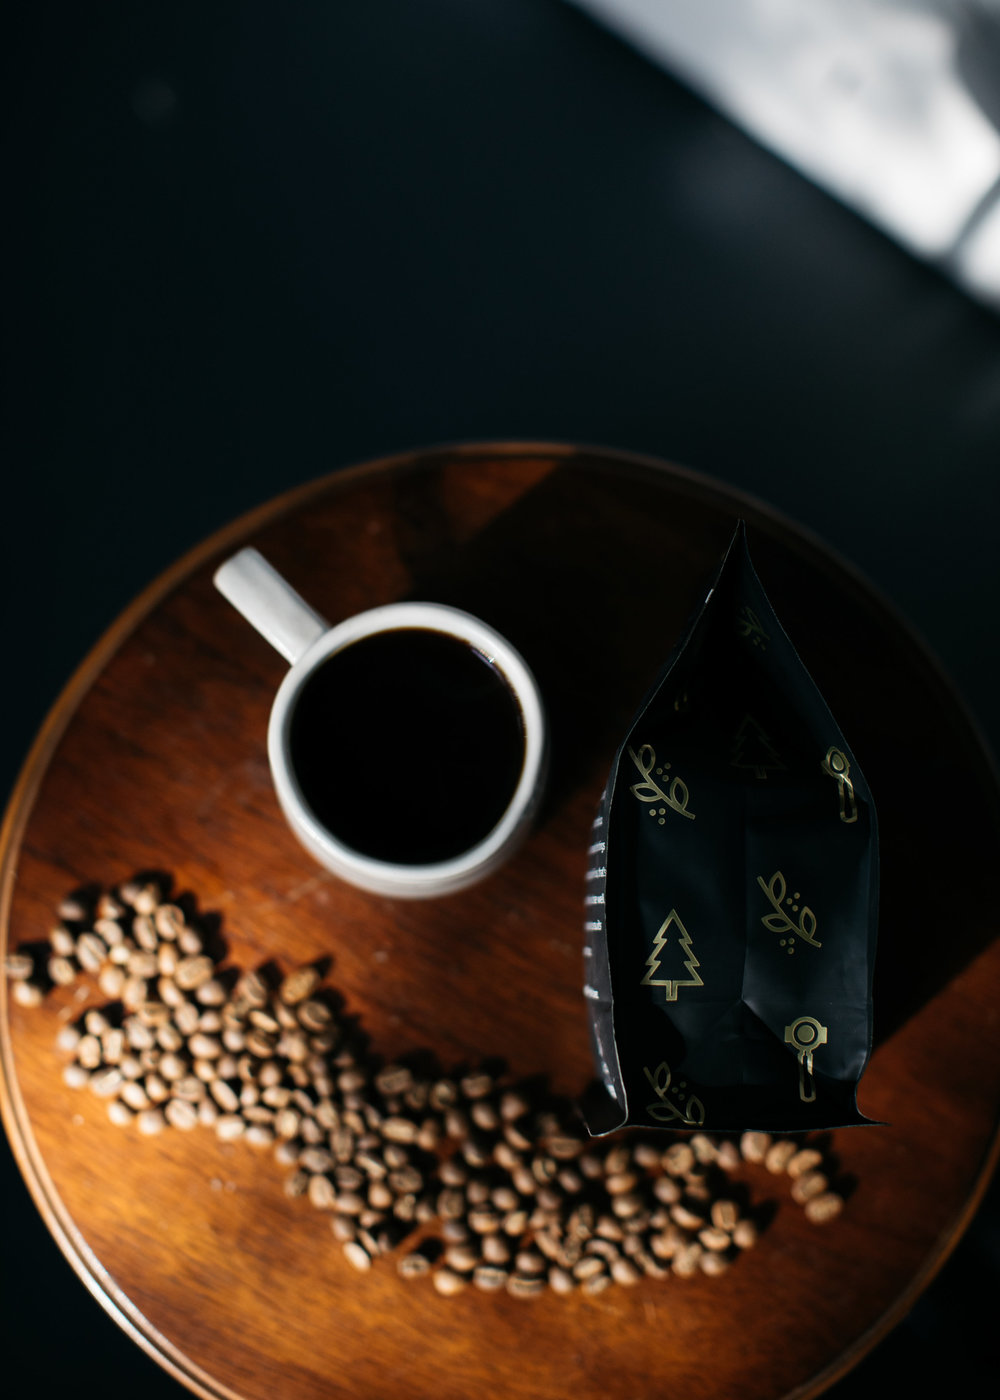 Hold-Fast-Coffee-Colorado-Springs-17.jpg